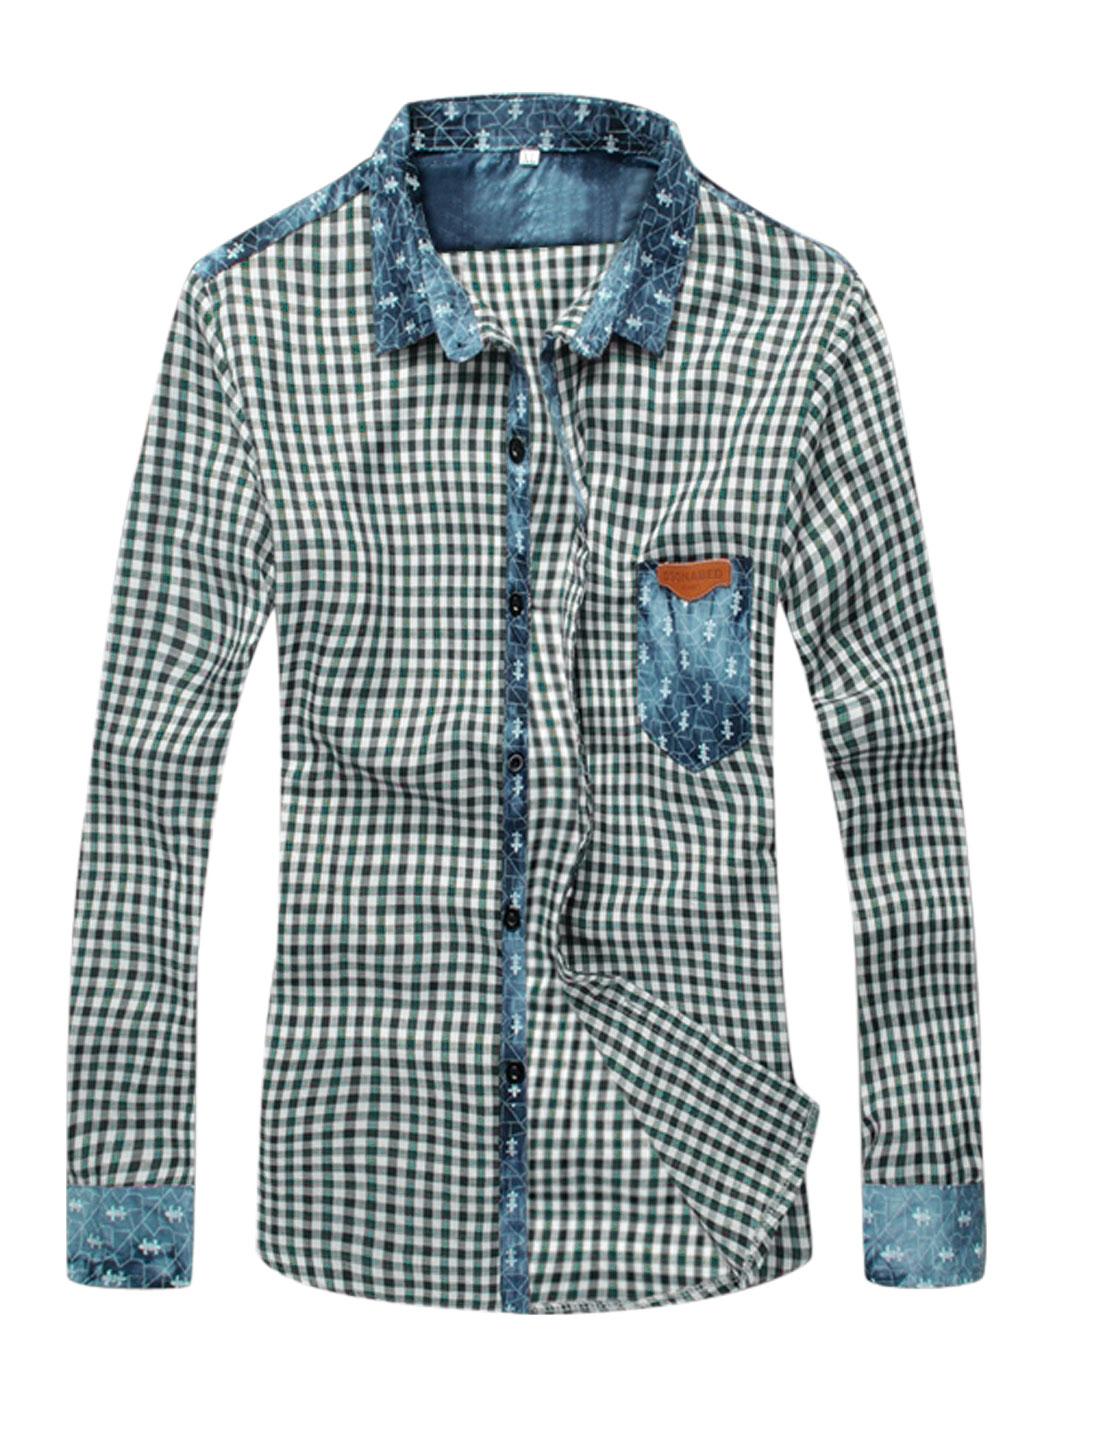 Men Point Collar Plaids Panel Design Casual Shirt Green White S